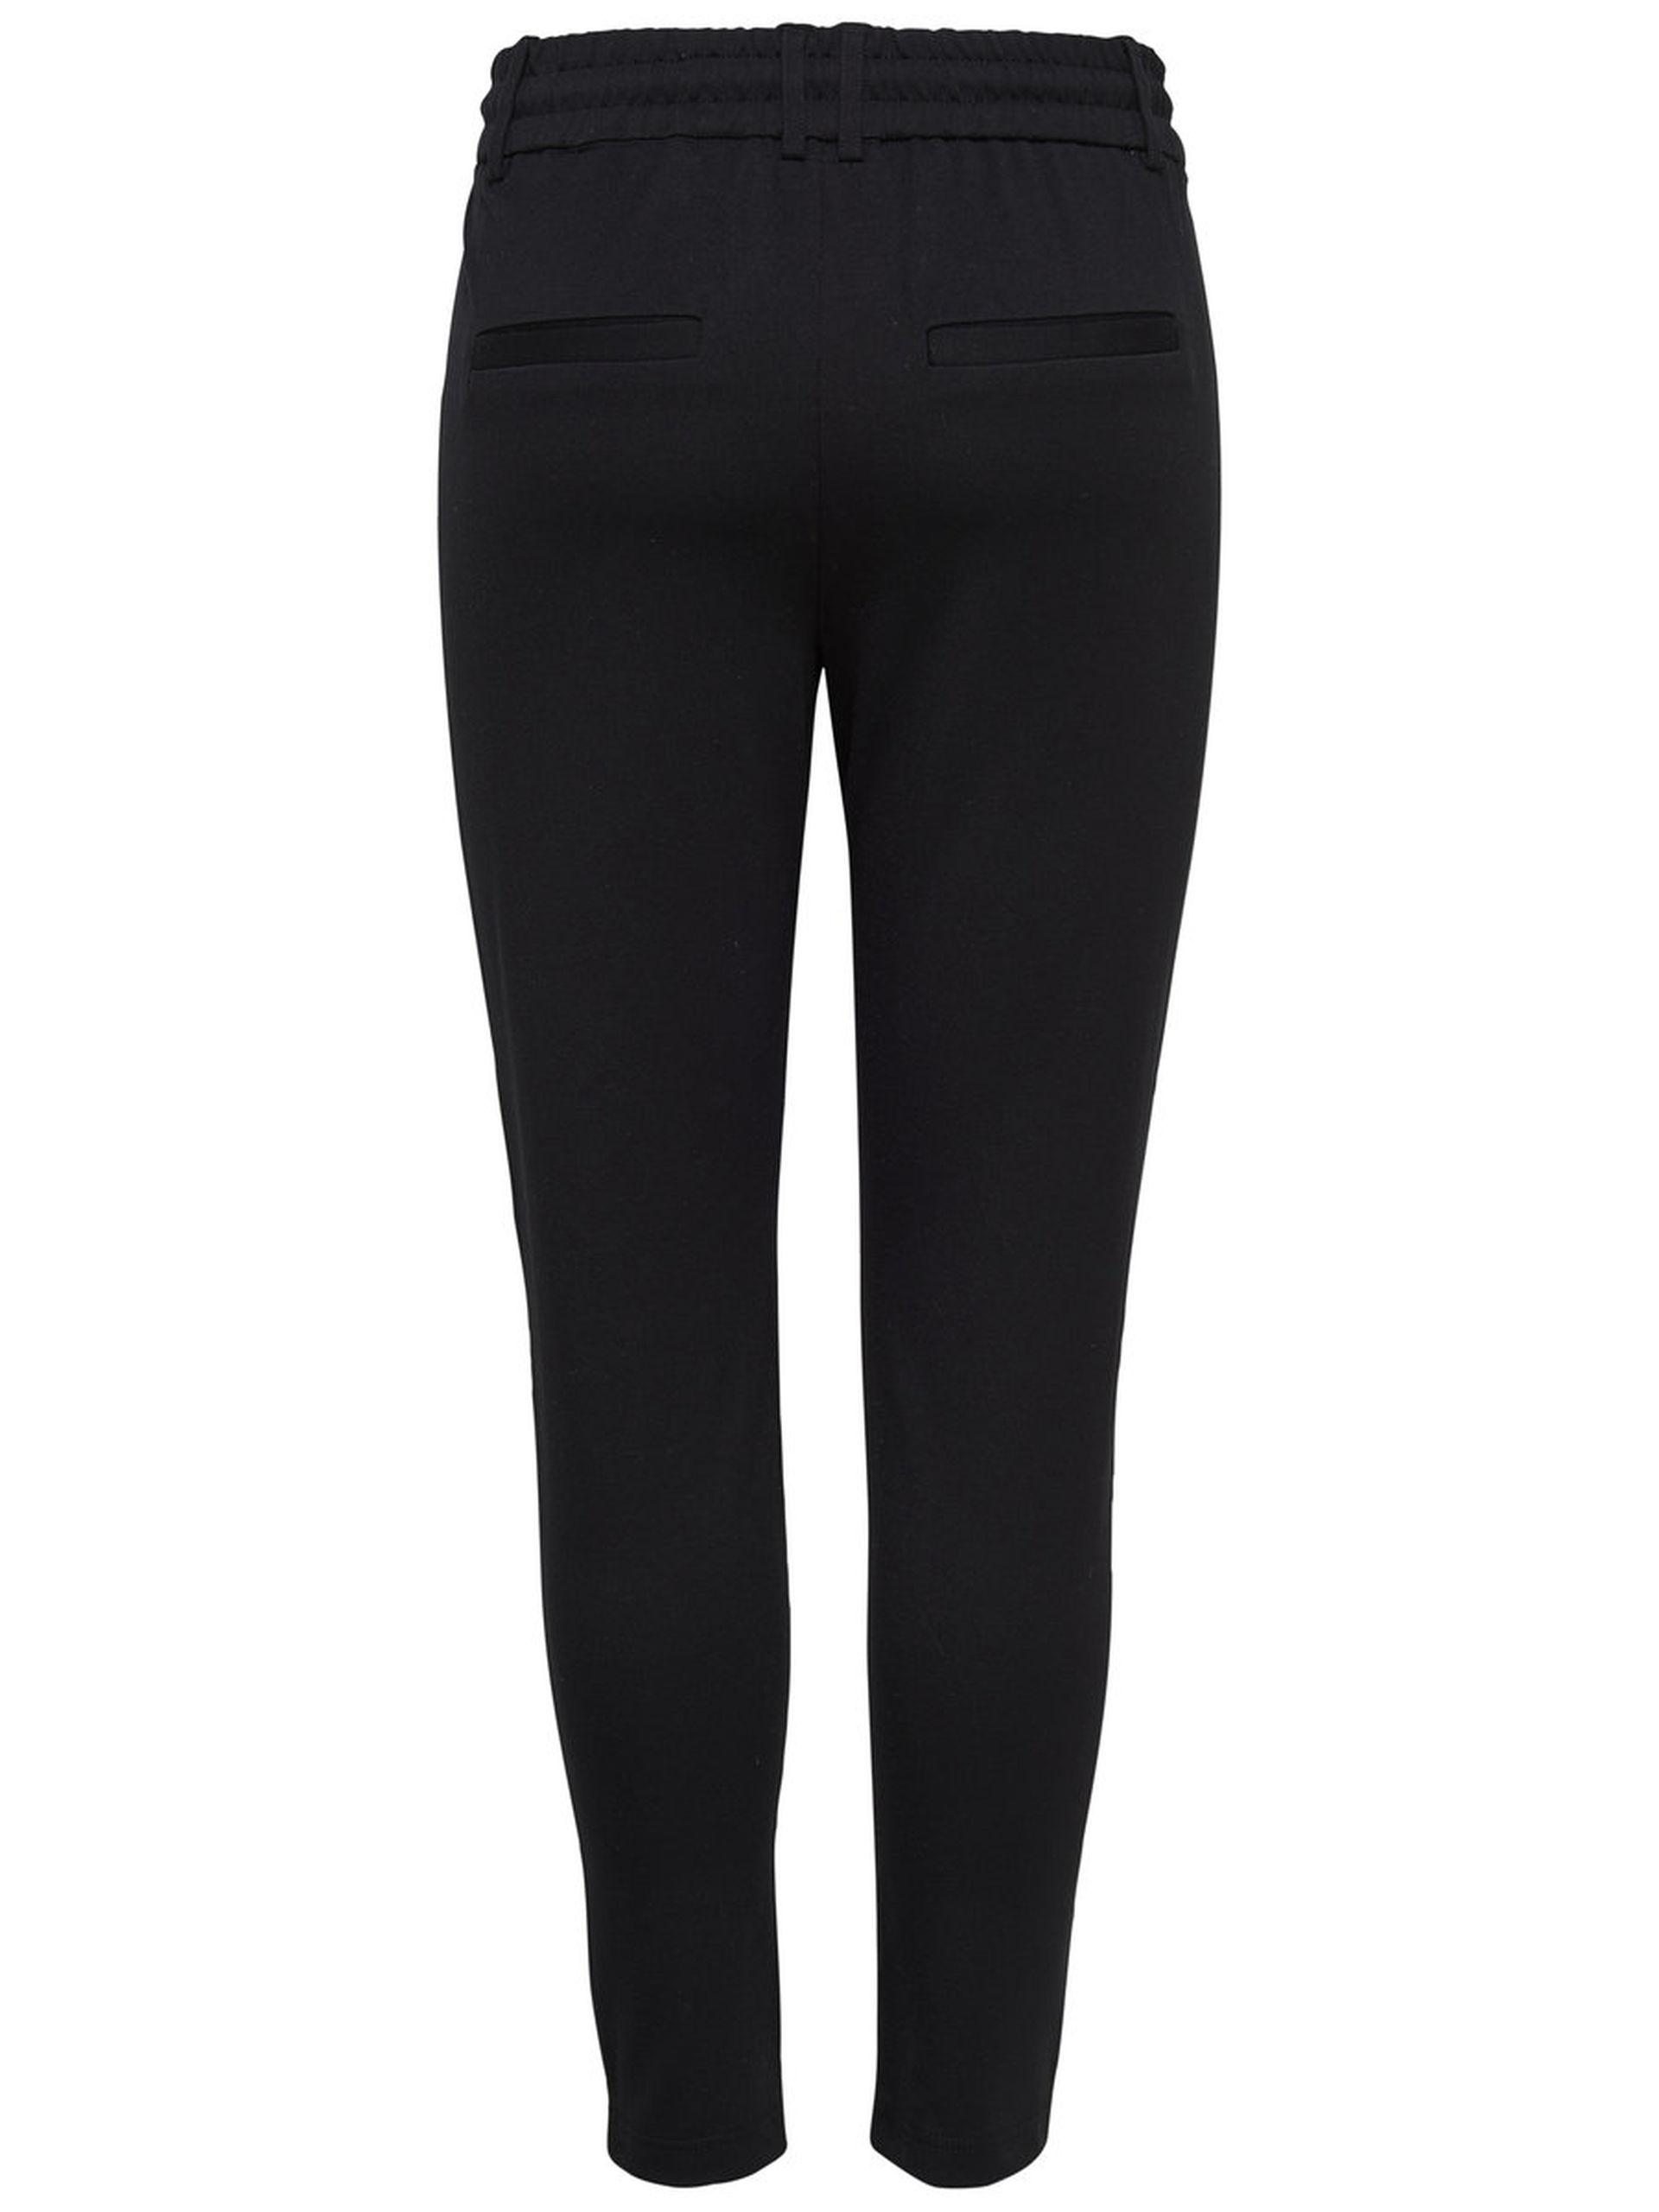 ONLY Poptrash bukser, black, x-small/34